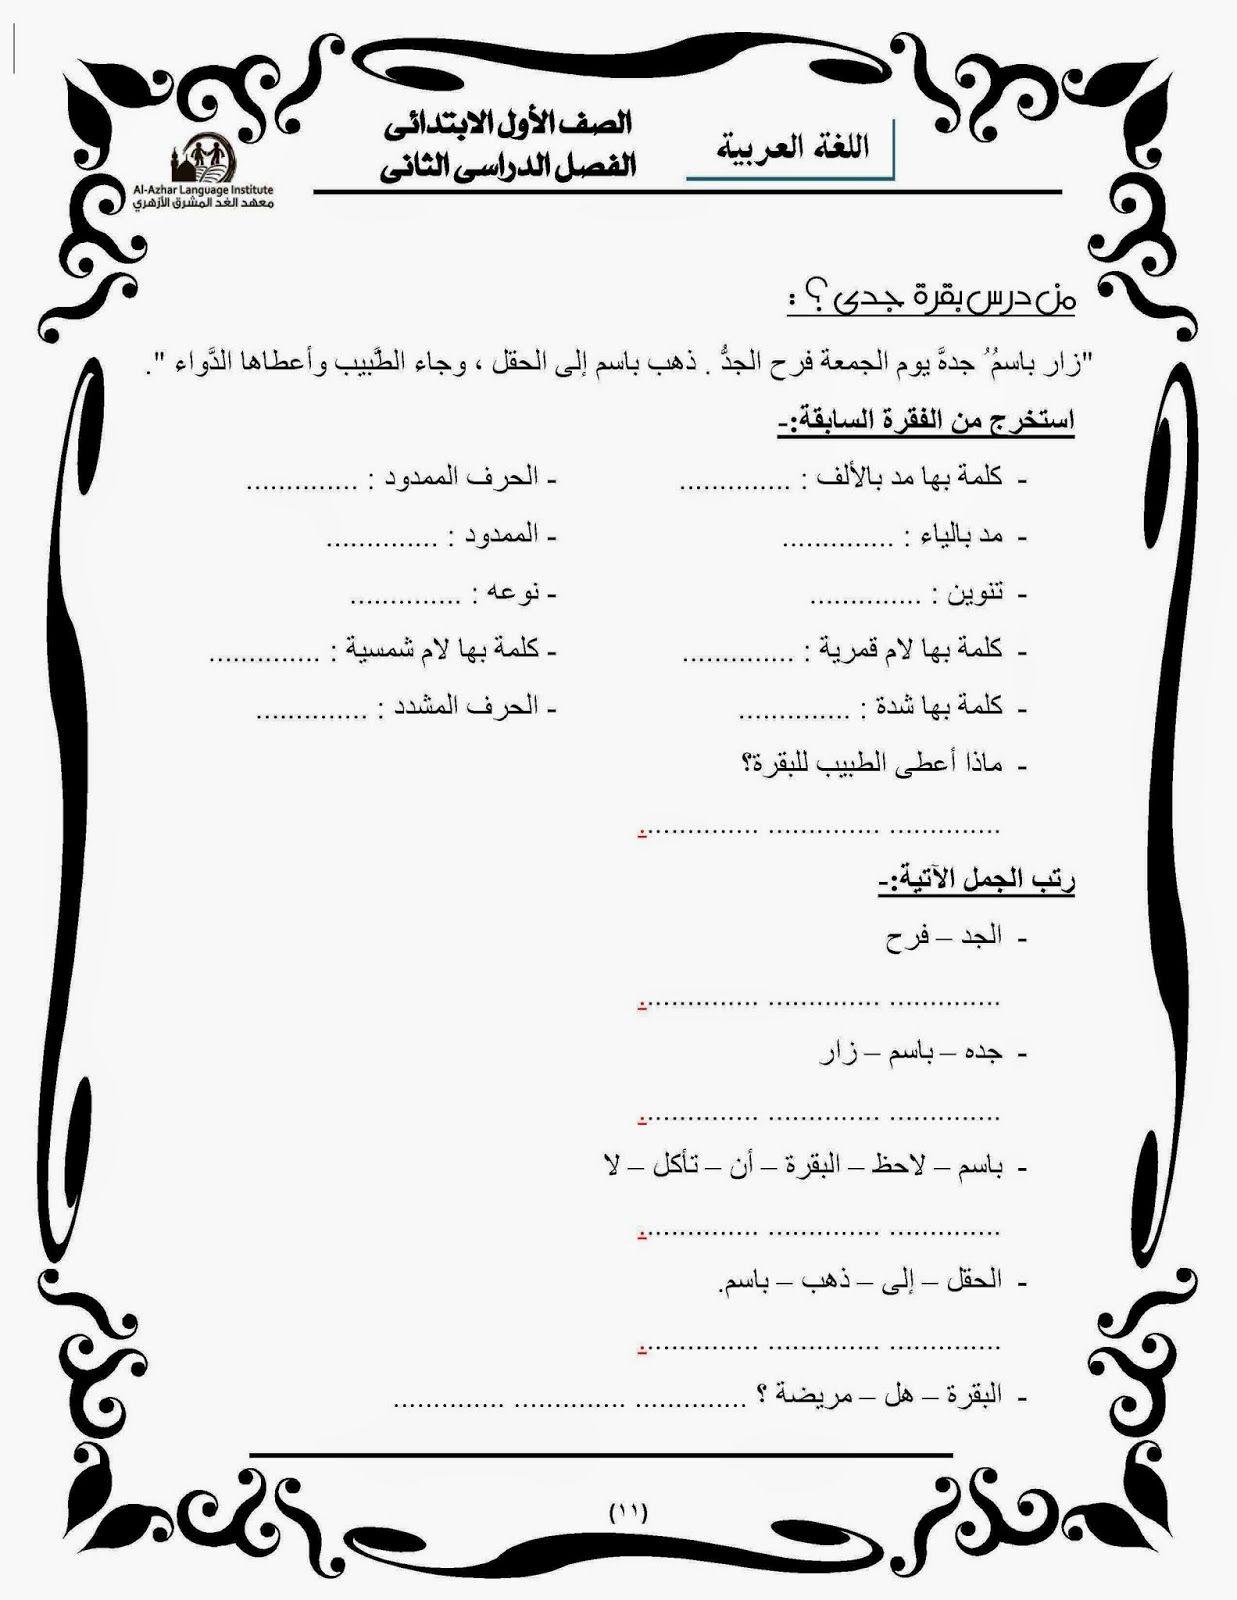 pin by naima mustapha on arabic worksheet learning arabic learn arabic online arabic lessons. Black Bedroom Furniture Sets. Home Design Ideas